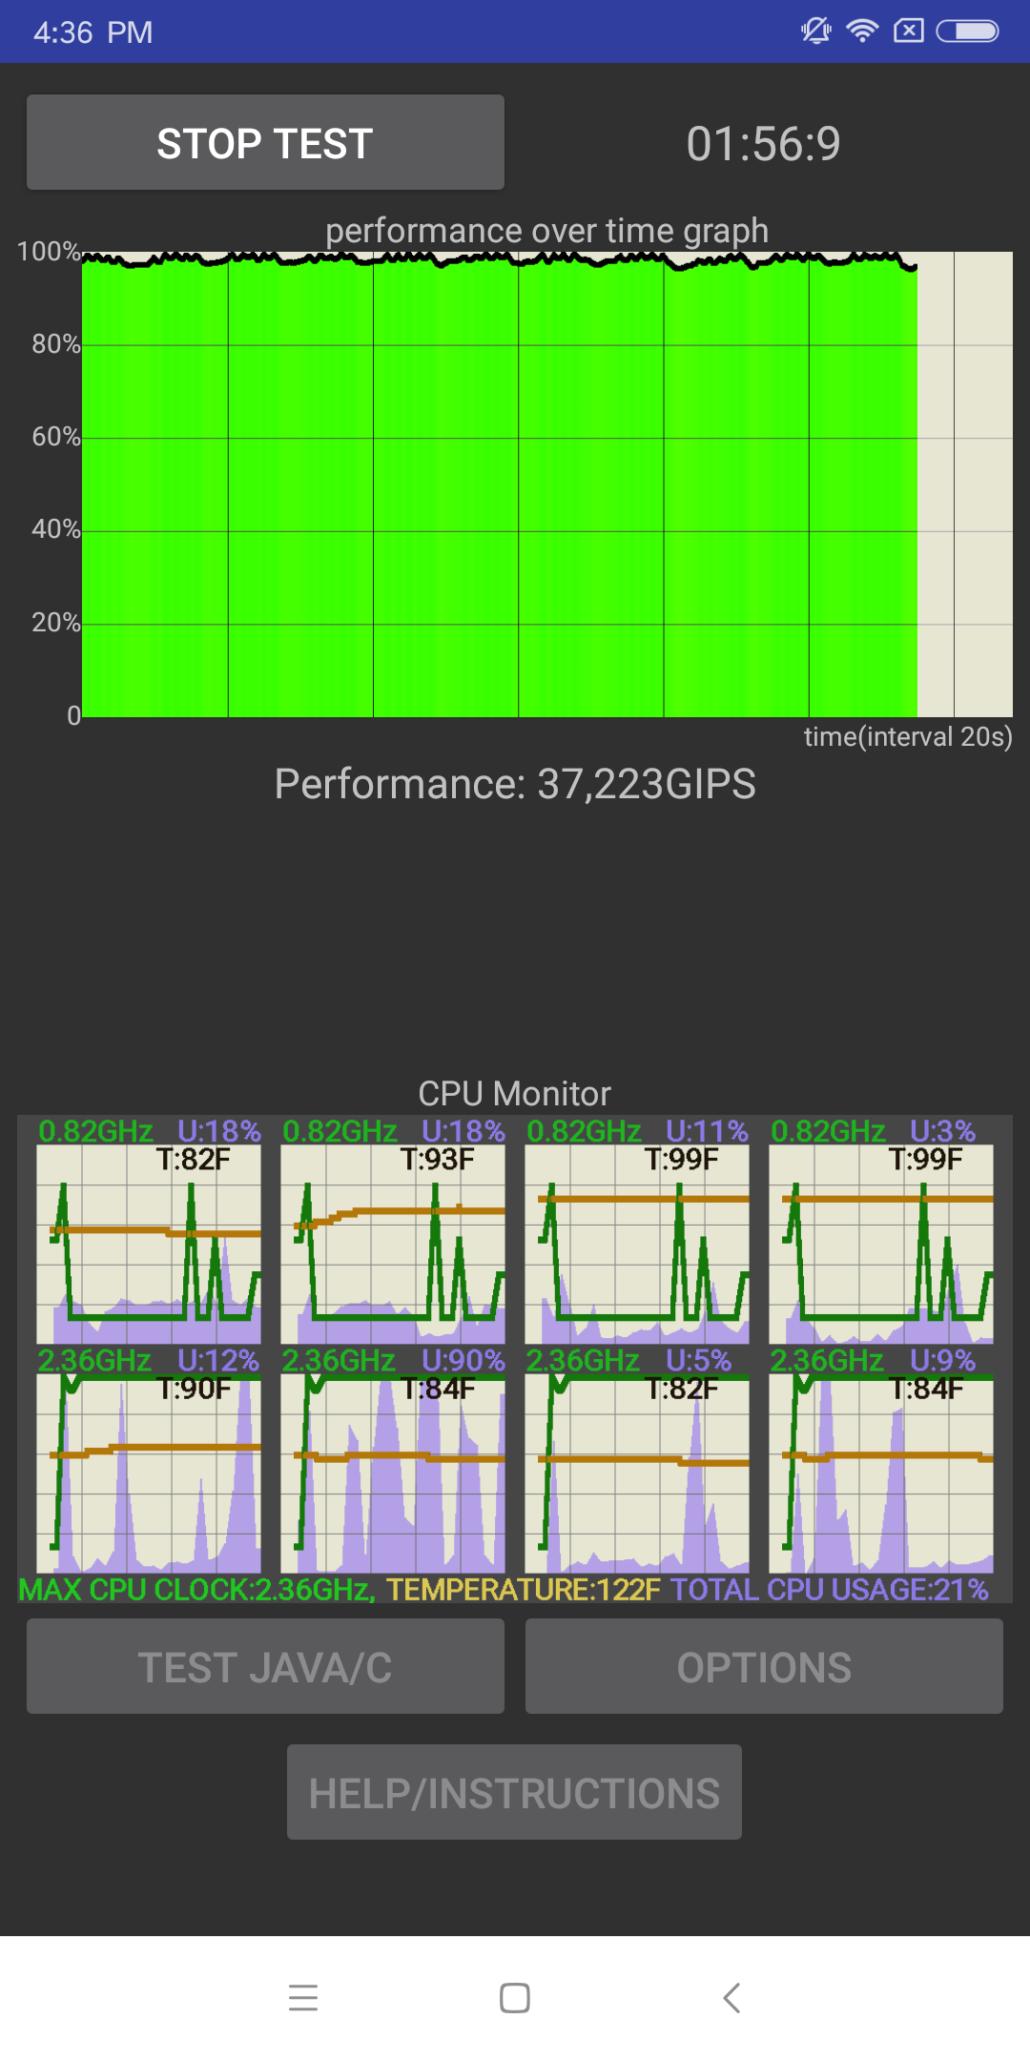 screenshot_2018-01-29-16-36-03-203_skynet-cputhrottlingtest-2